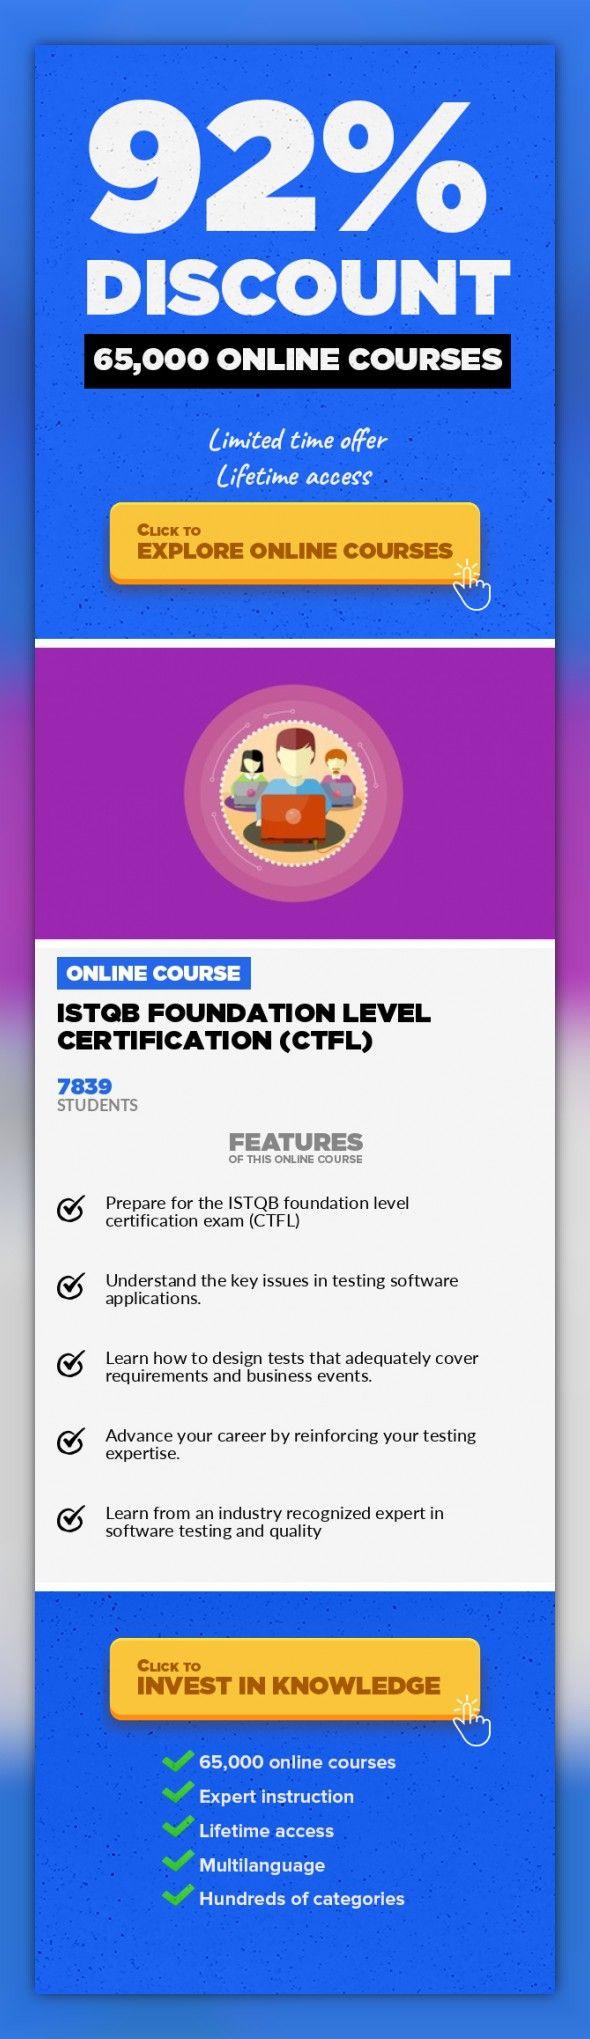 Istqb Foundation Level Certification Ctfl It Certification It